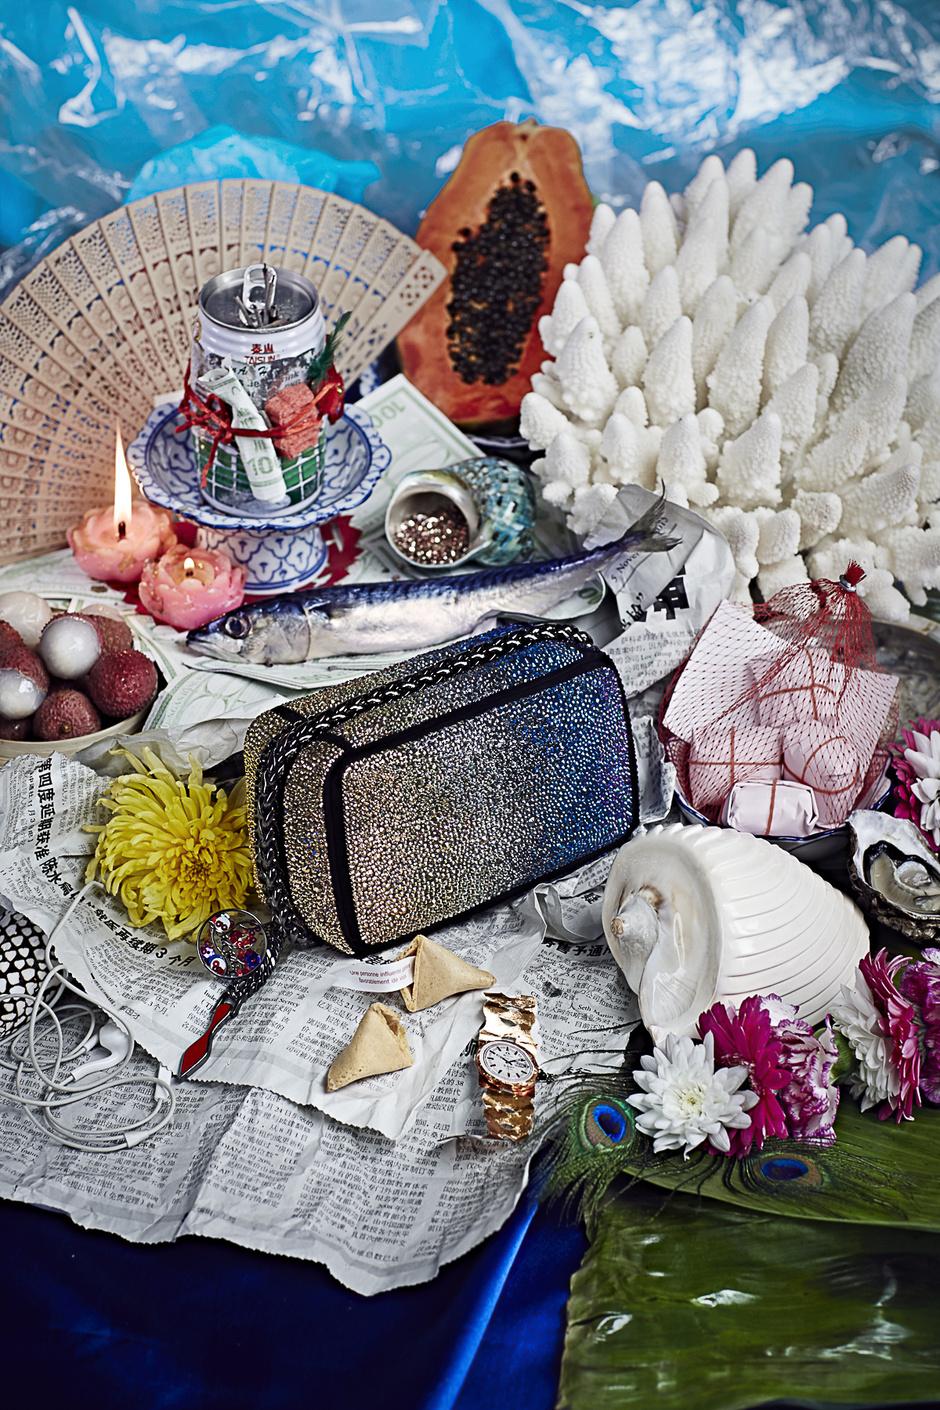 Christian Louboutin выпустил новую коллекцию клатчей Piloutin